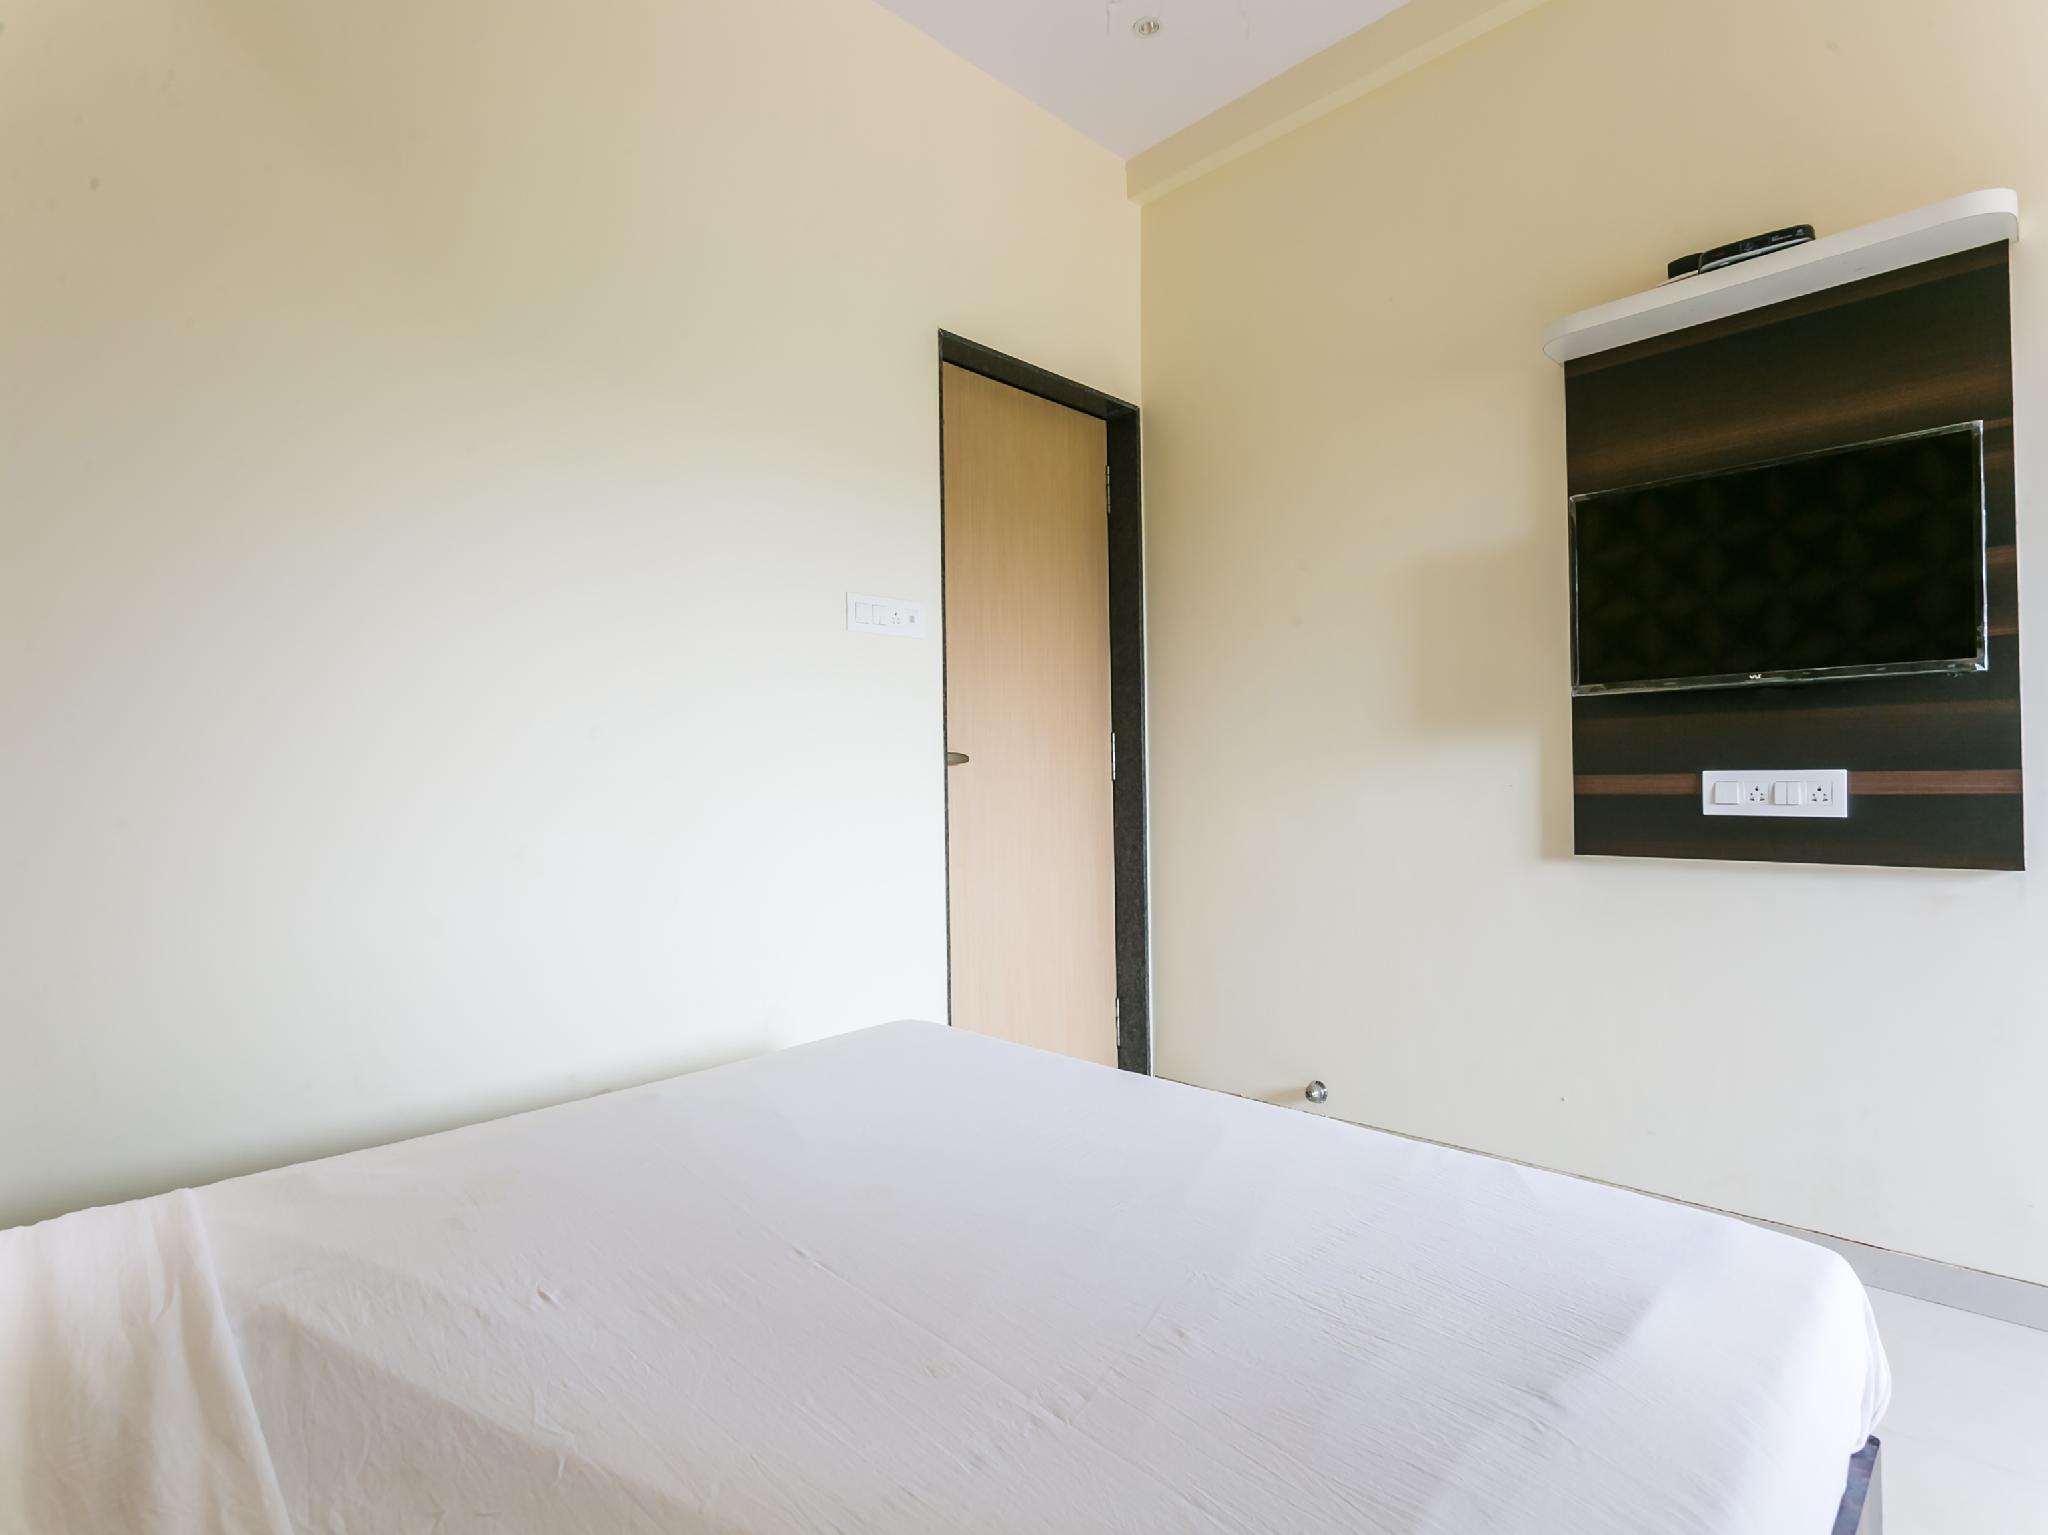 SPOT ON 47497 Hotel Fantacee, Palghar